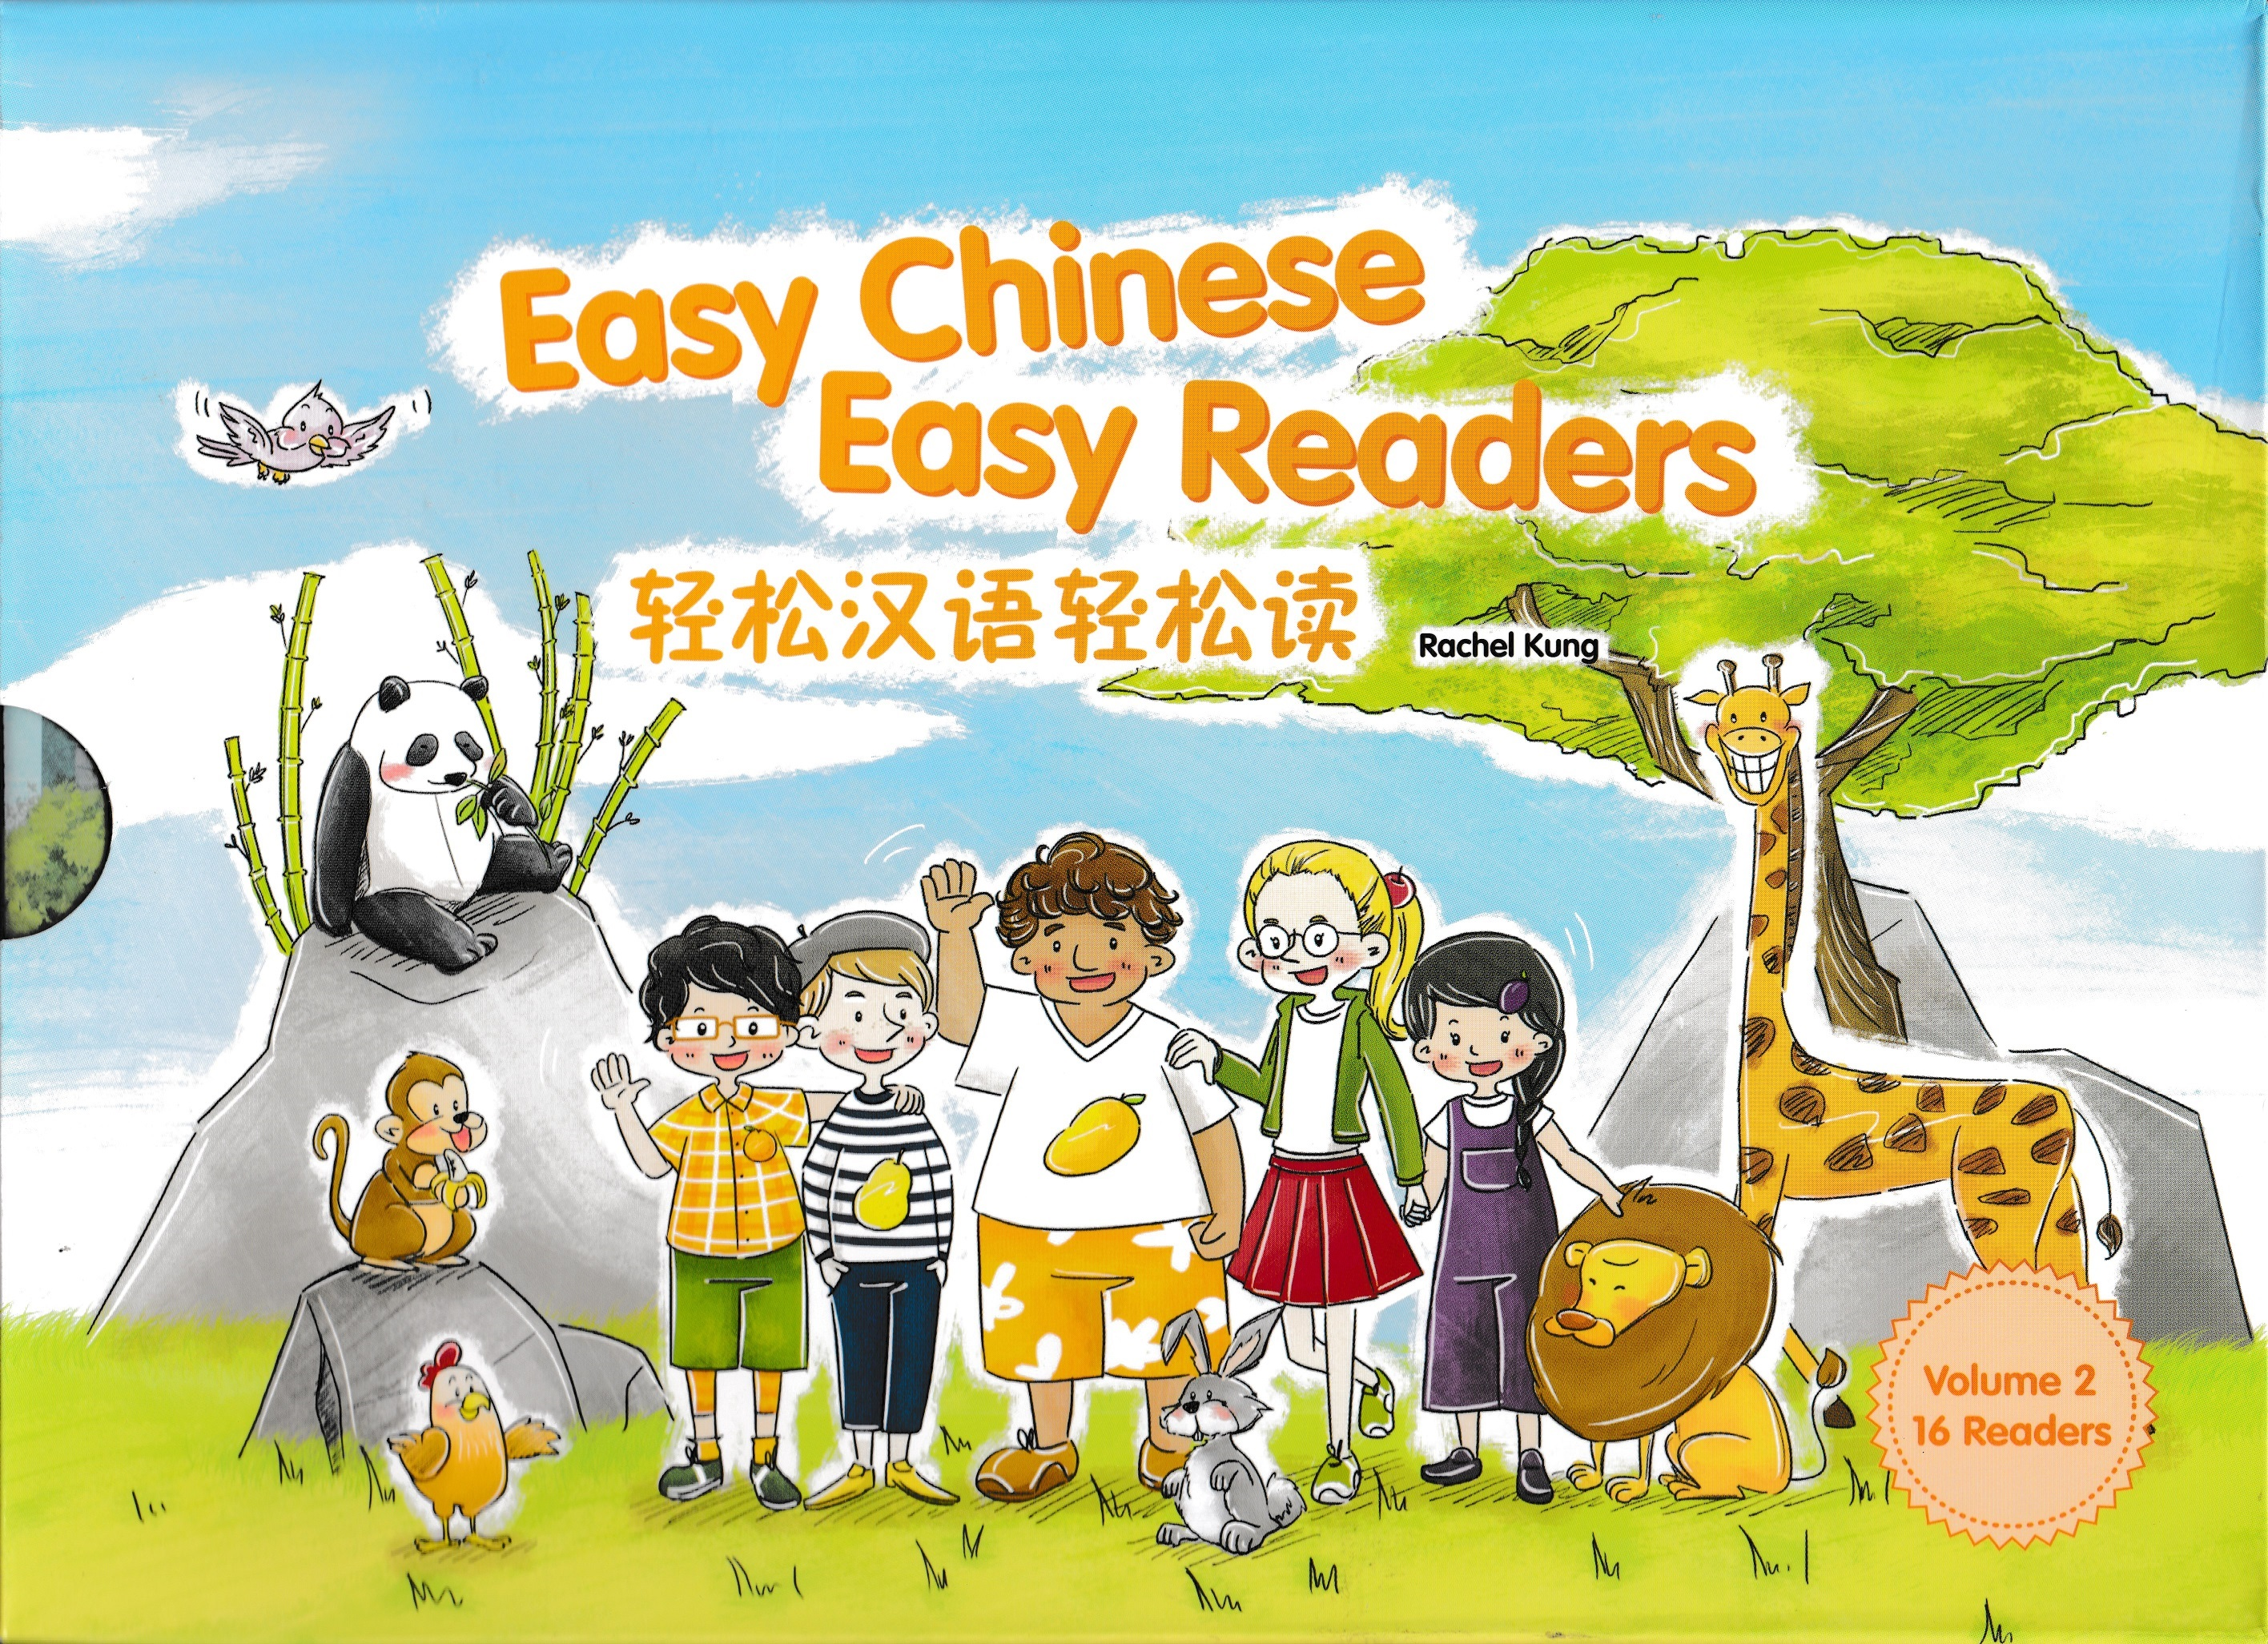 Easy Chinese Easy Readers Volume 2